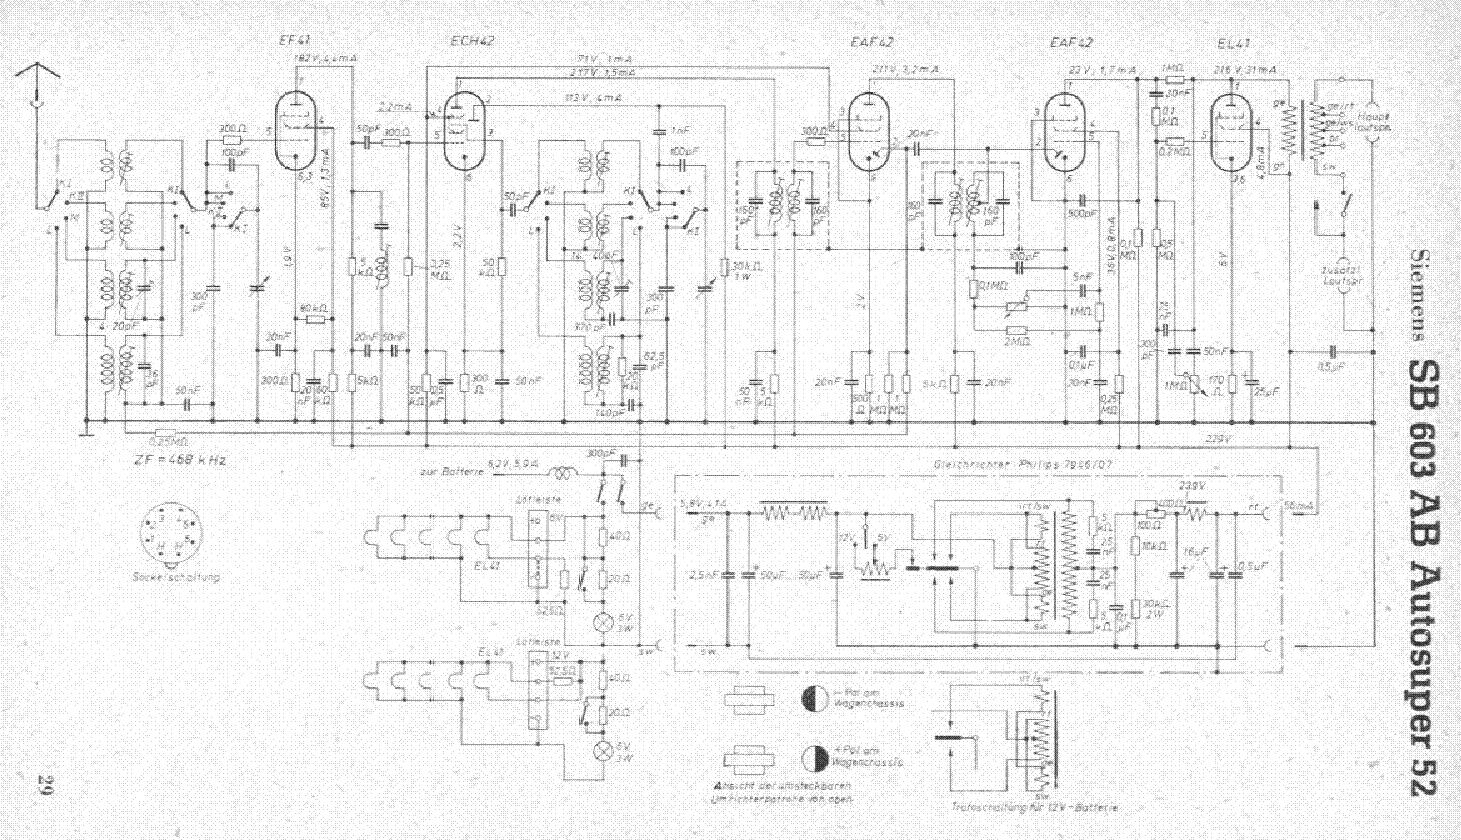 [Image: siemens_autosuper_sb-603_sch.pdf_1.png]